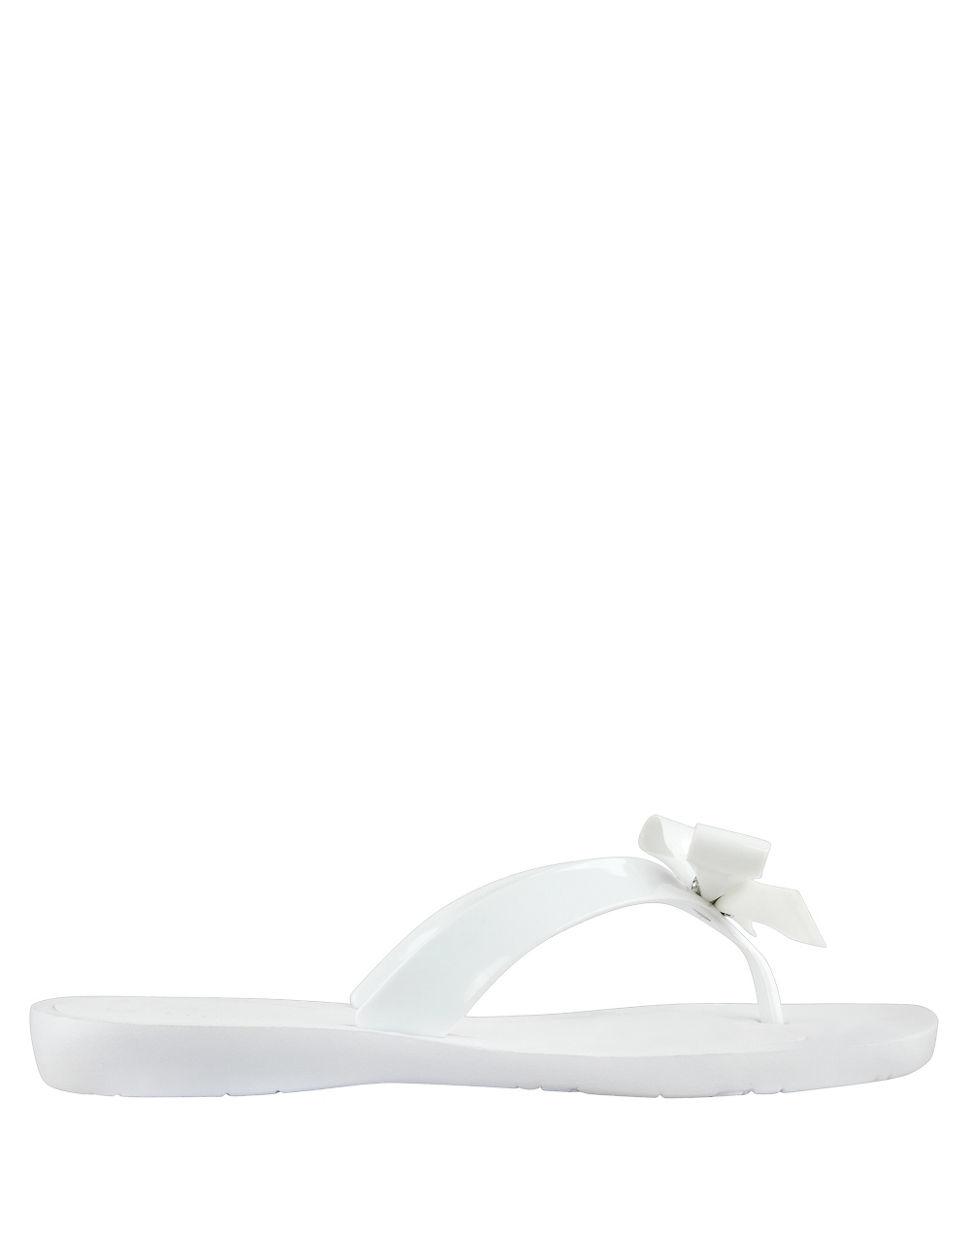 Guess Rubber Tutu Flip Flops In White Gray - Lyst-6483